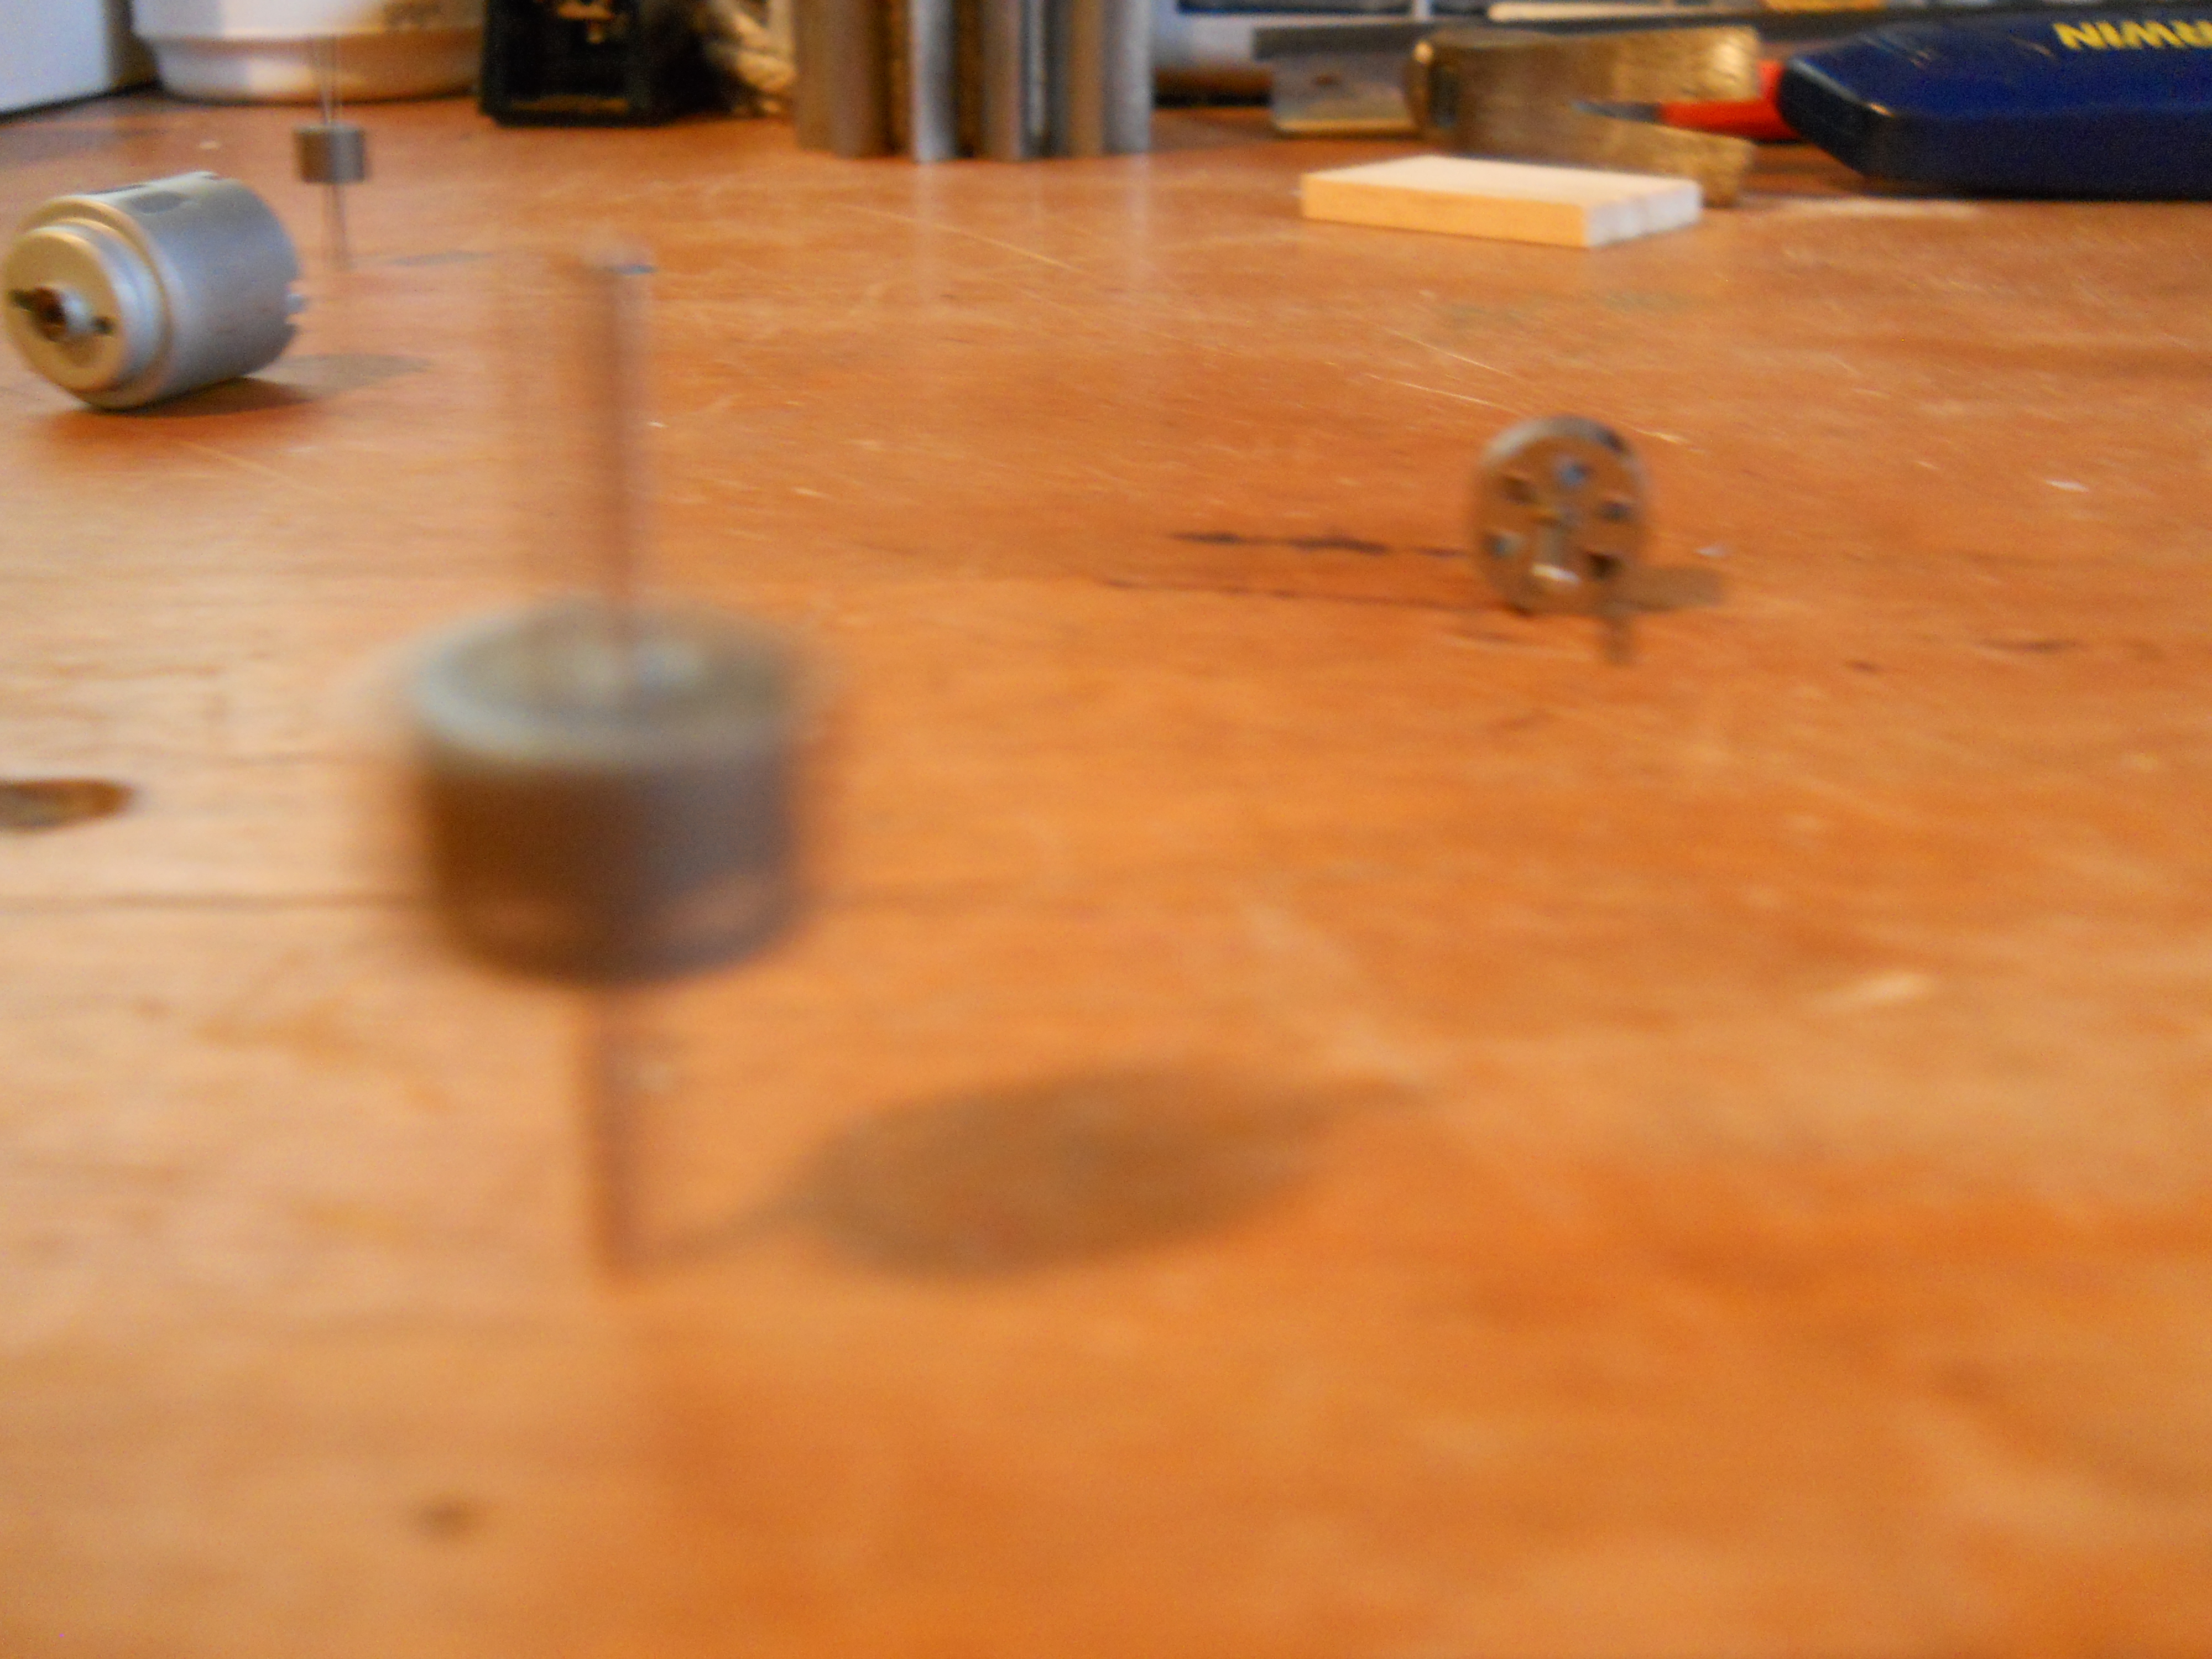 Electric Motor SpinningTop